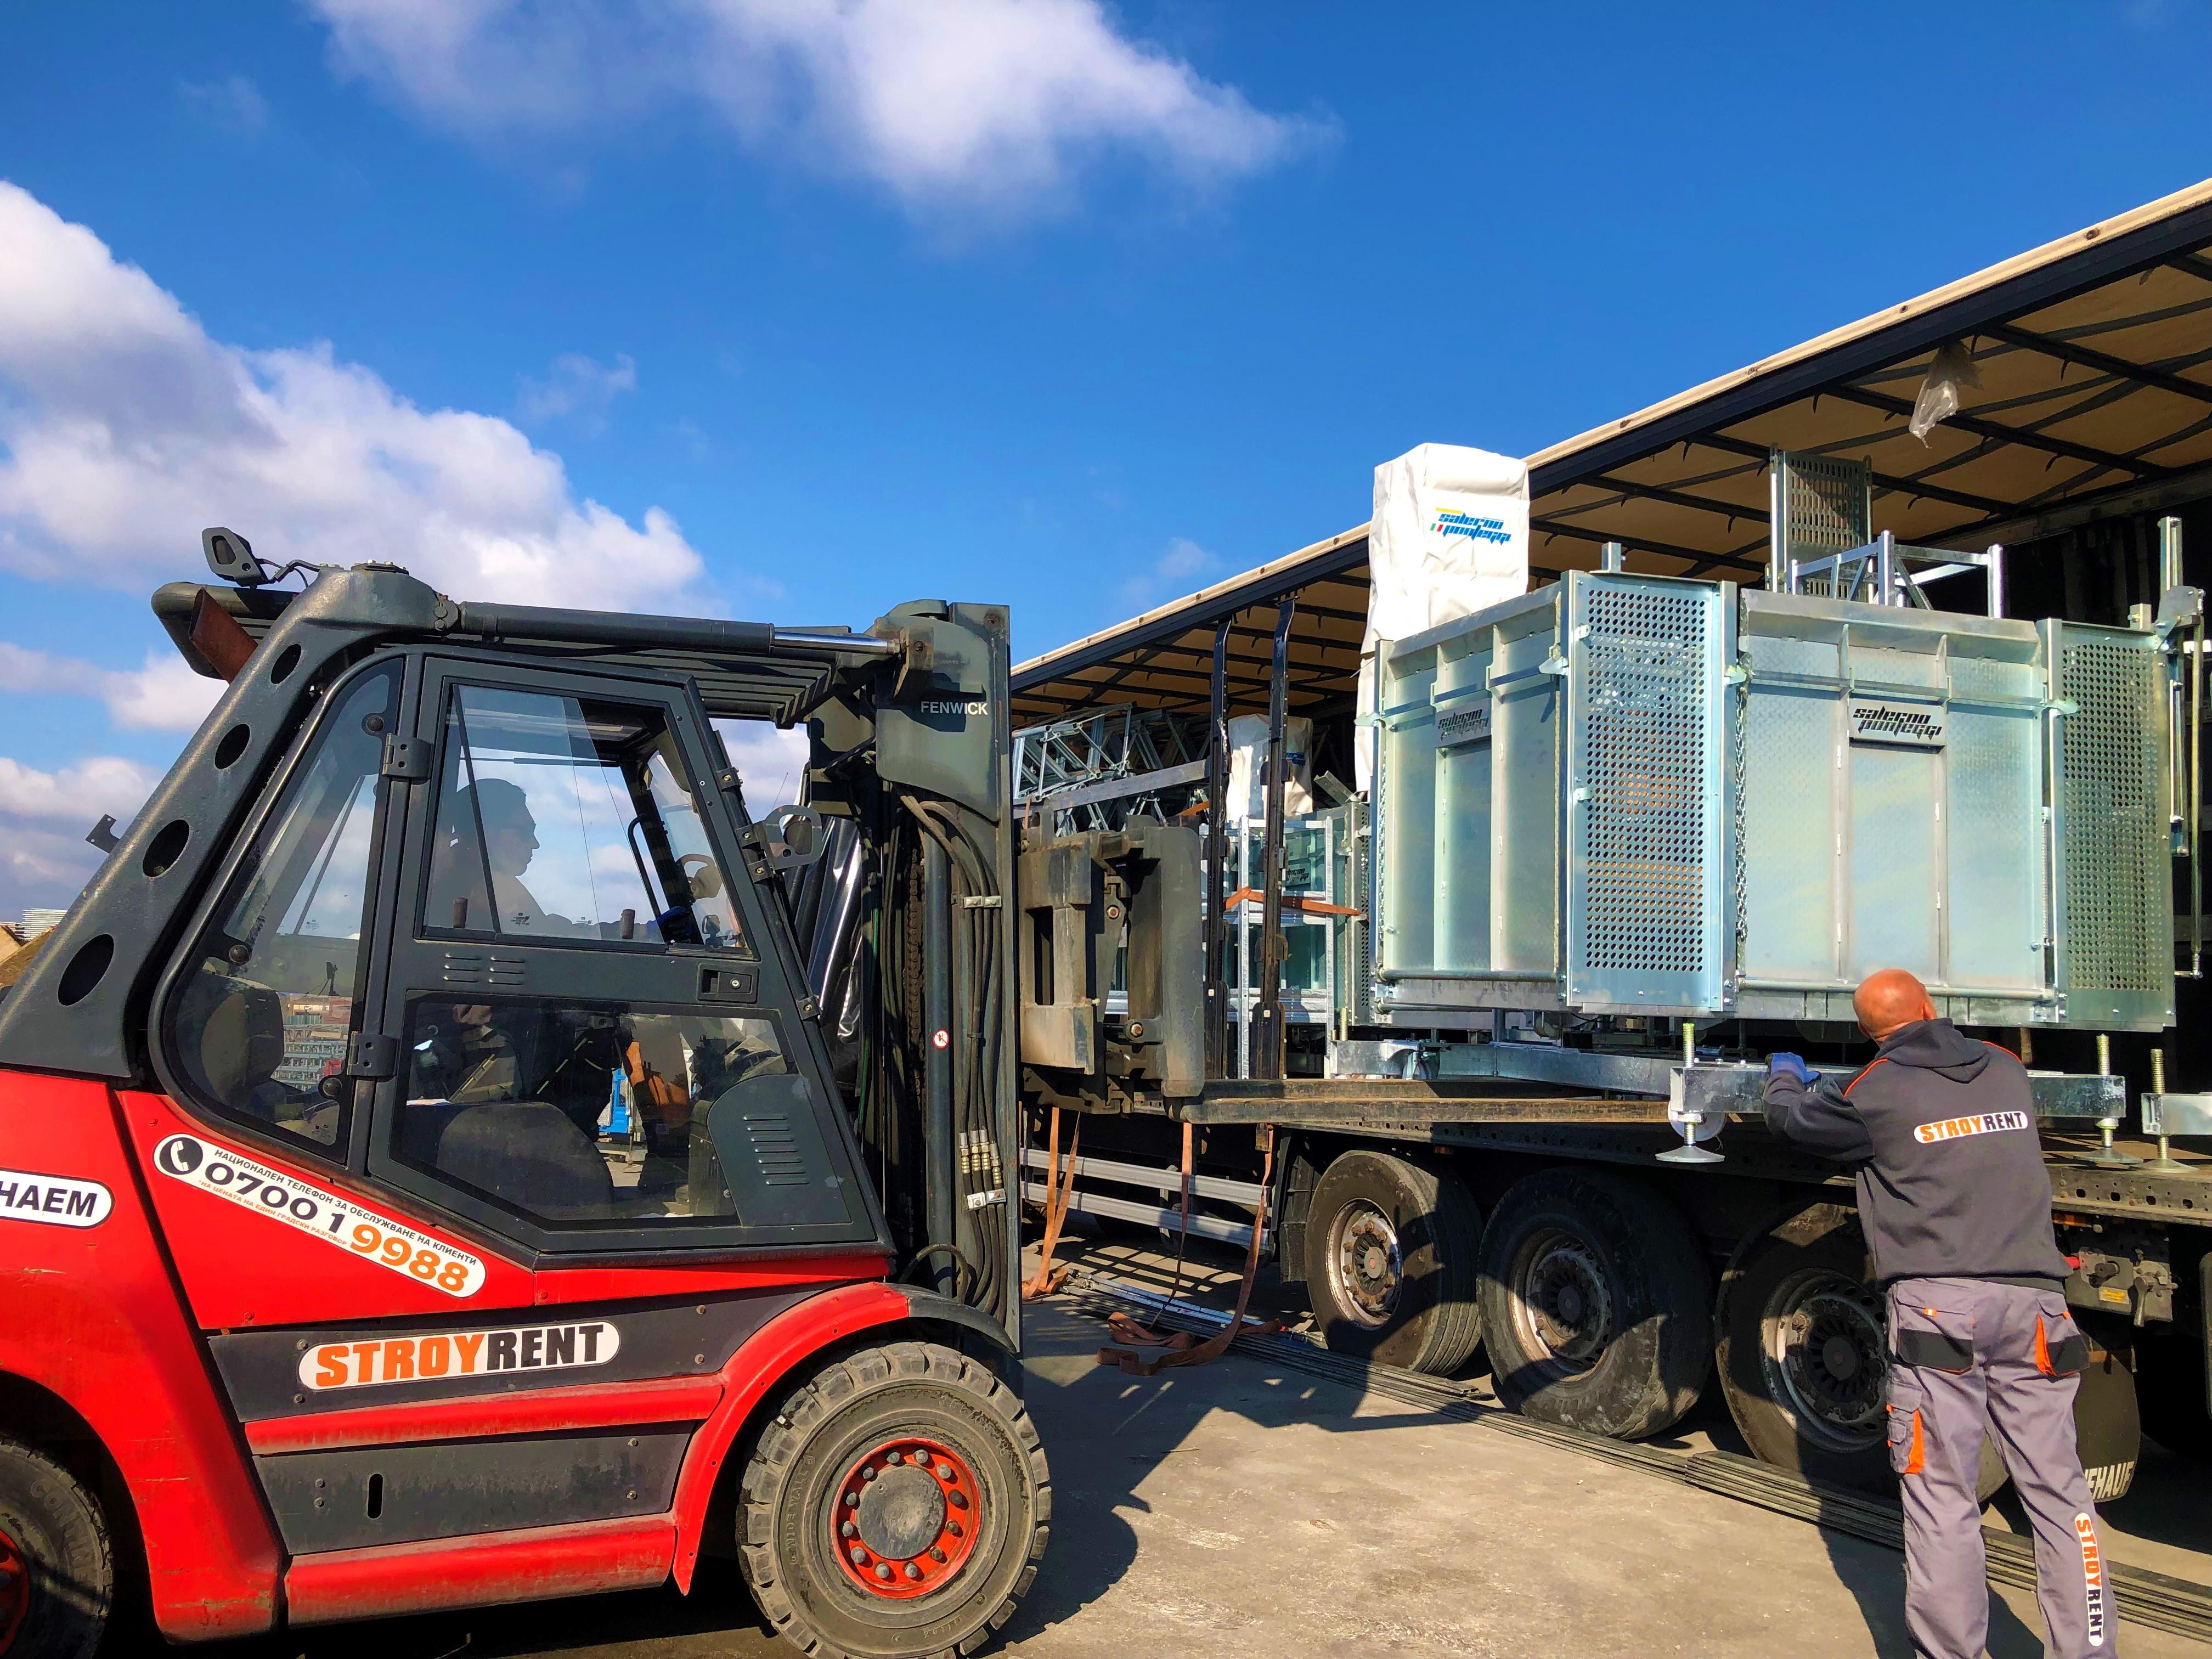 Ново оборудване в Стройрент